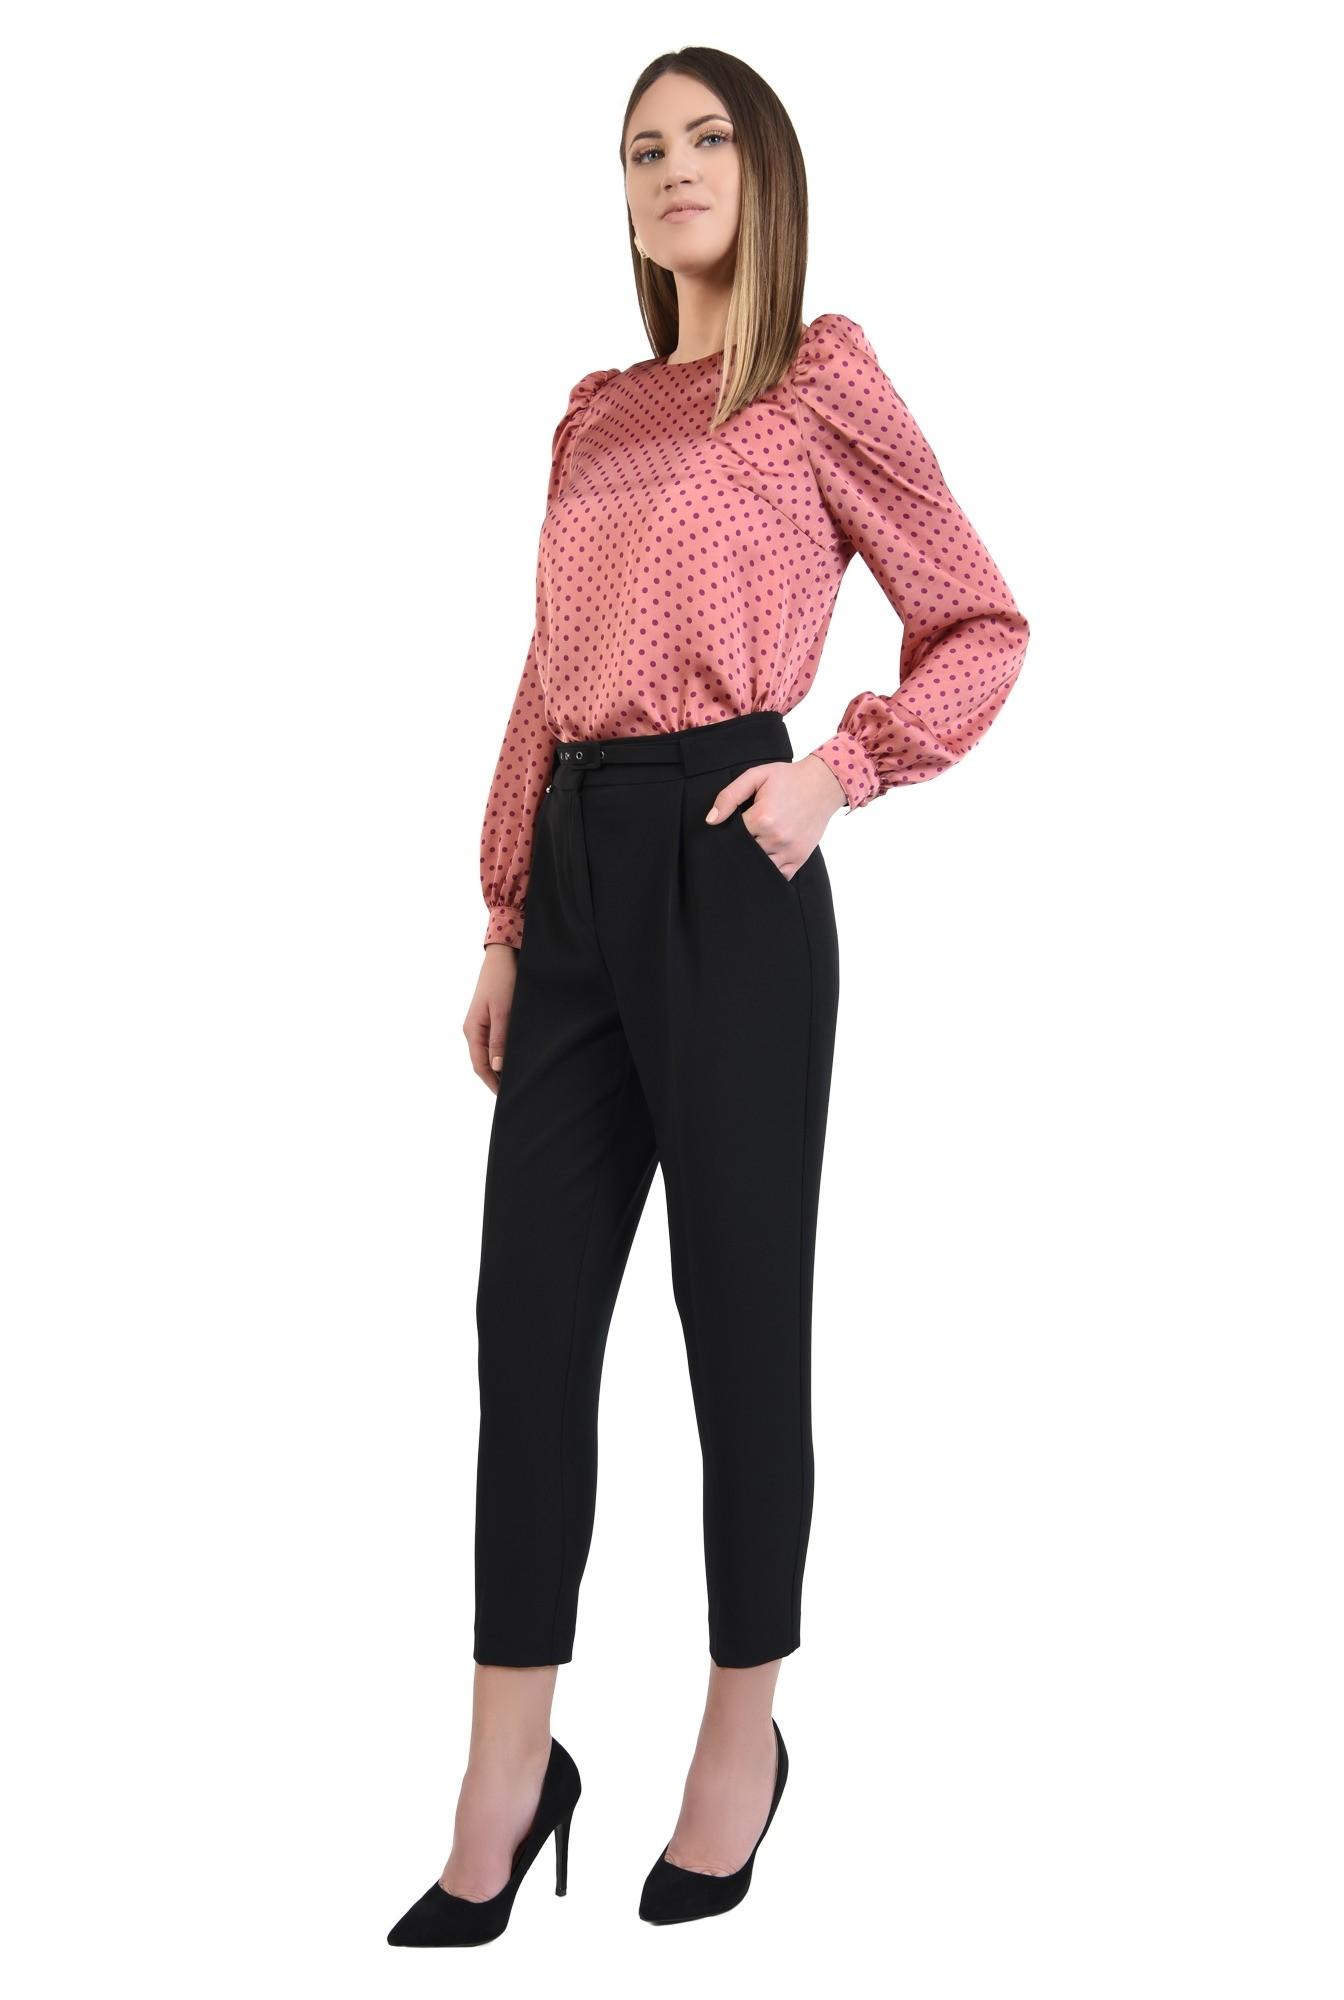 360 - bluza cu picouri, din satin roz, maneci lungi, croi drept, buline